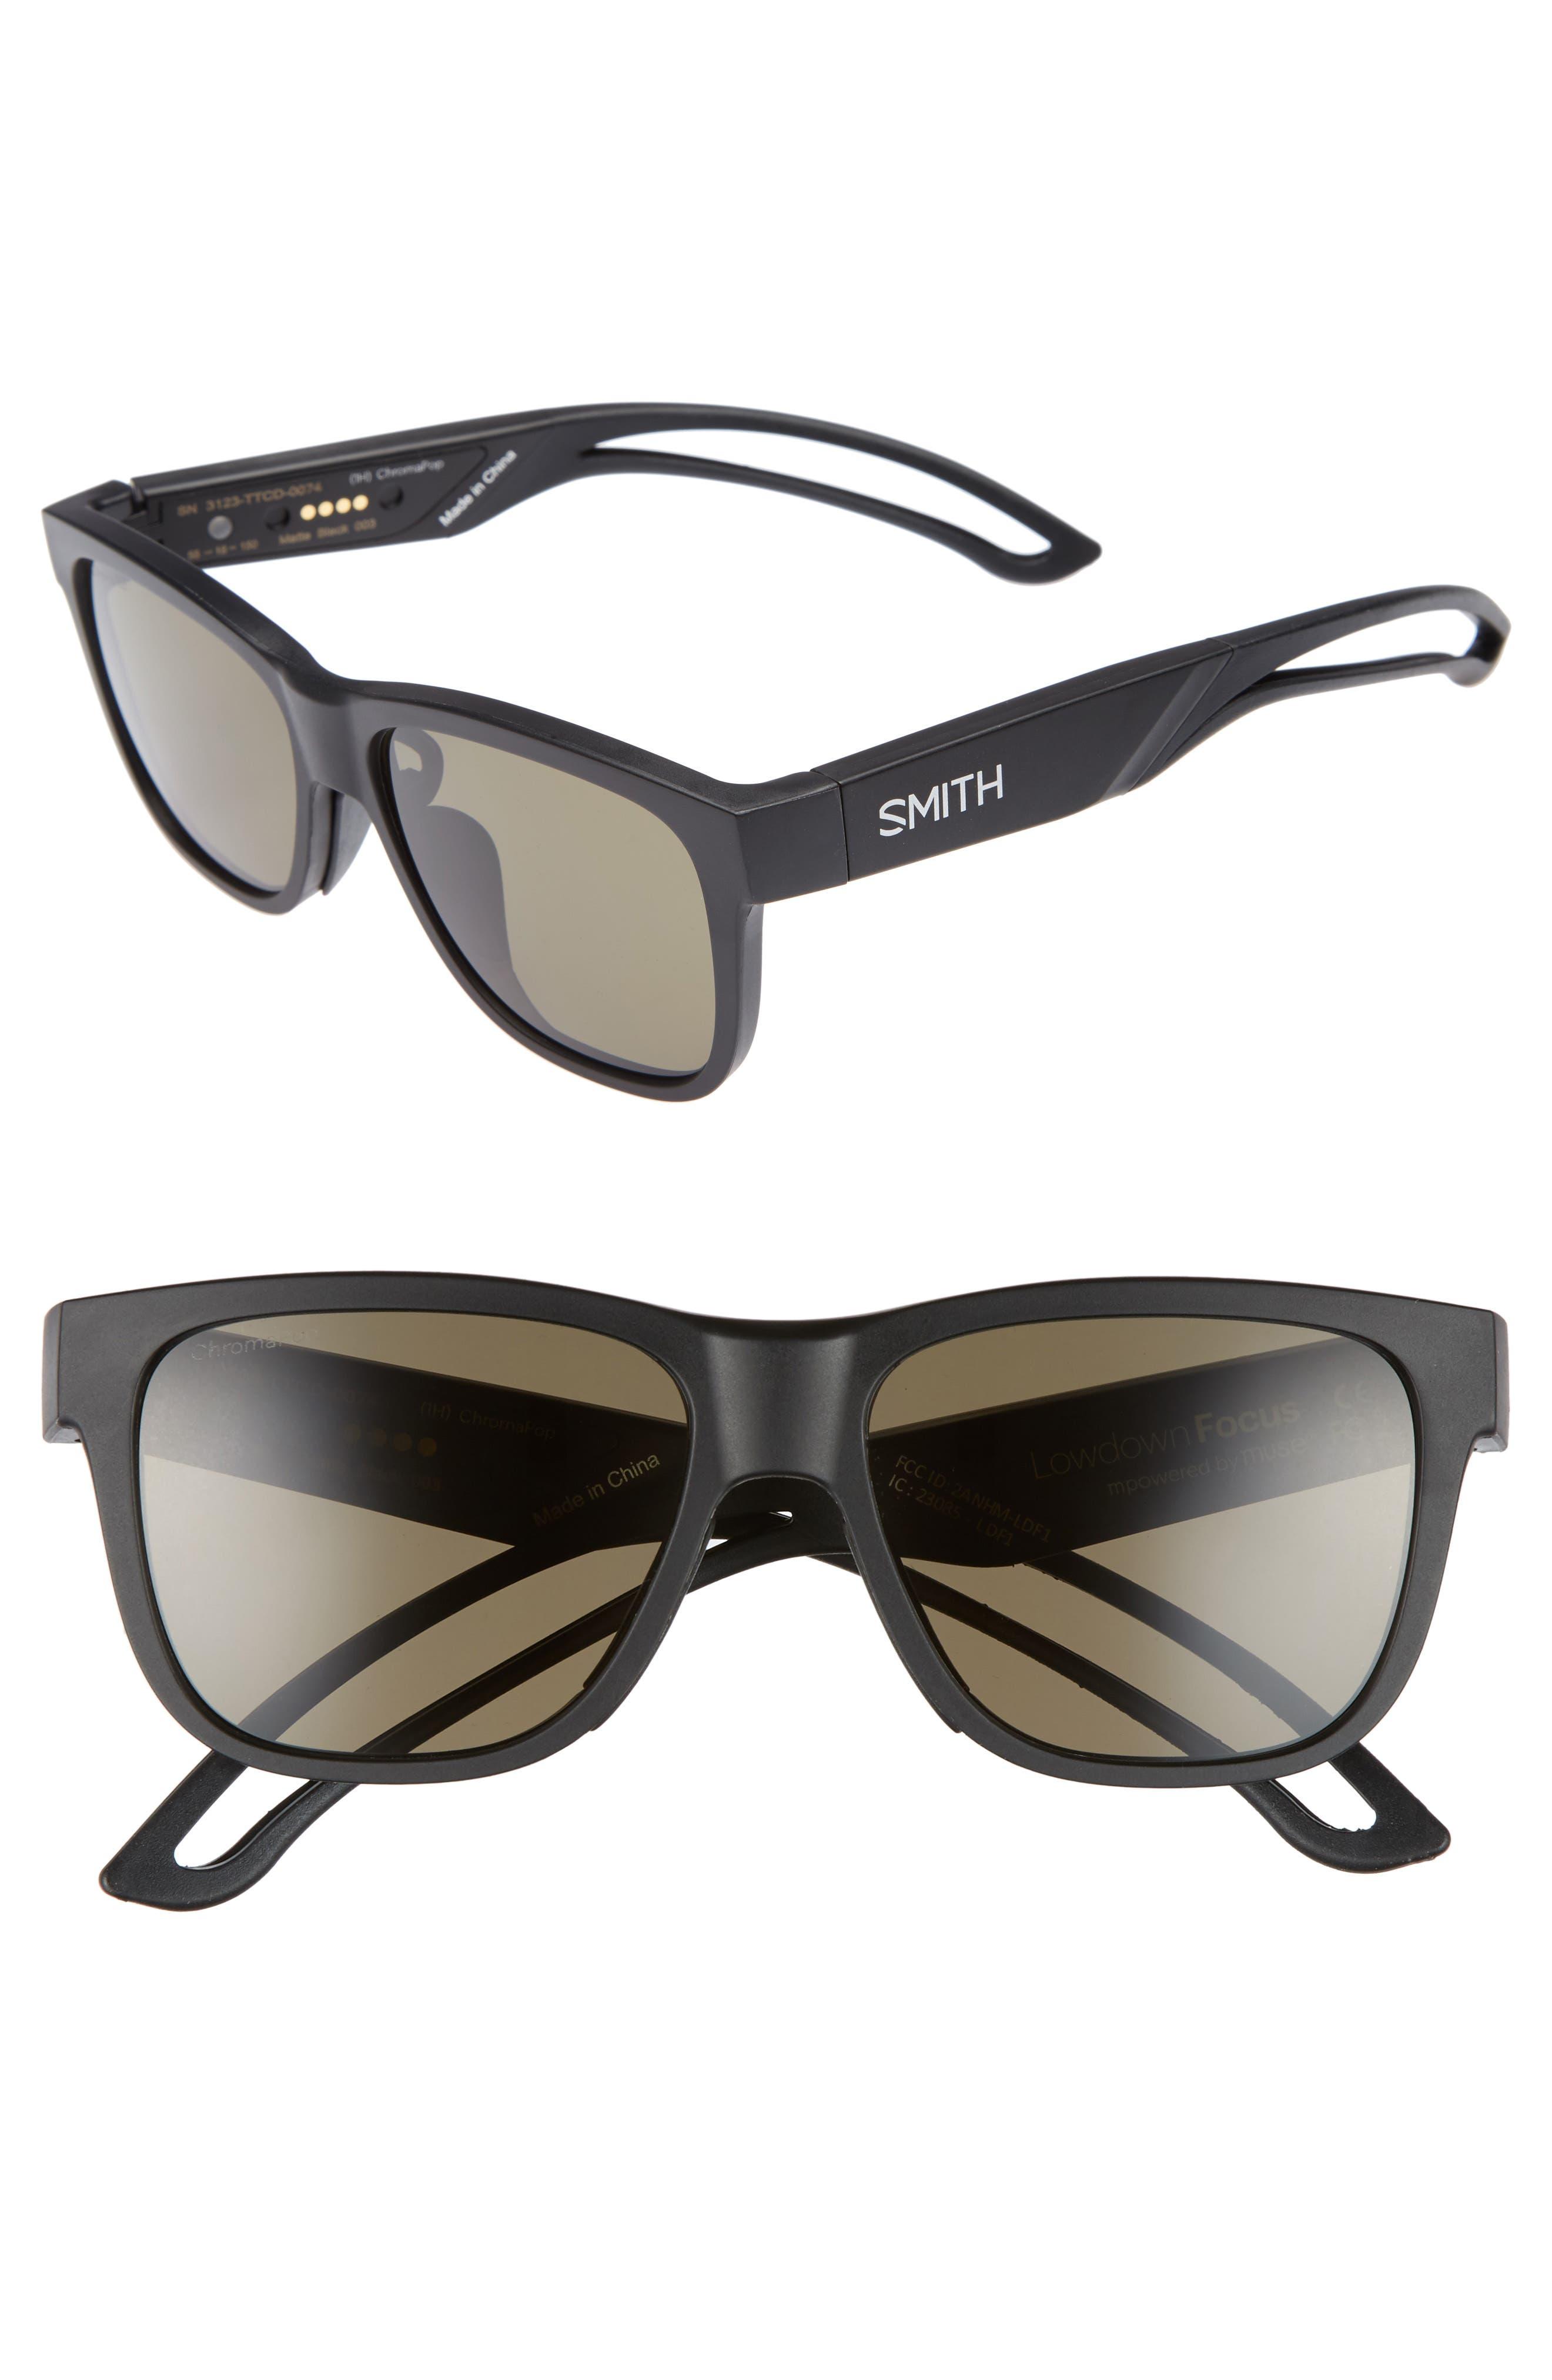 Main Image - Smith Lowdown Focus 56mm ChromaPop Sunglasses